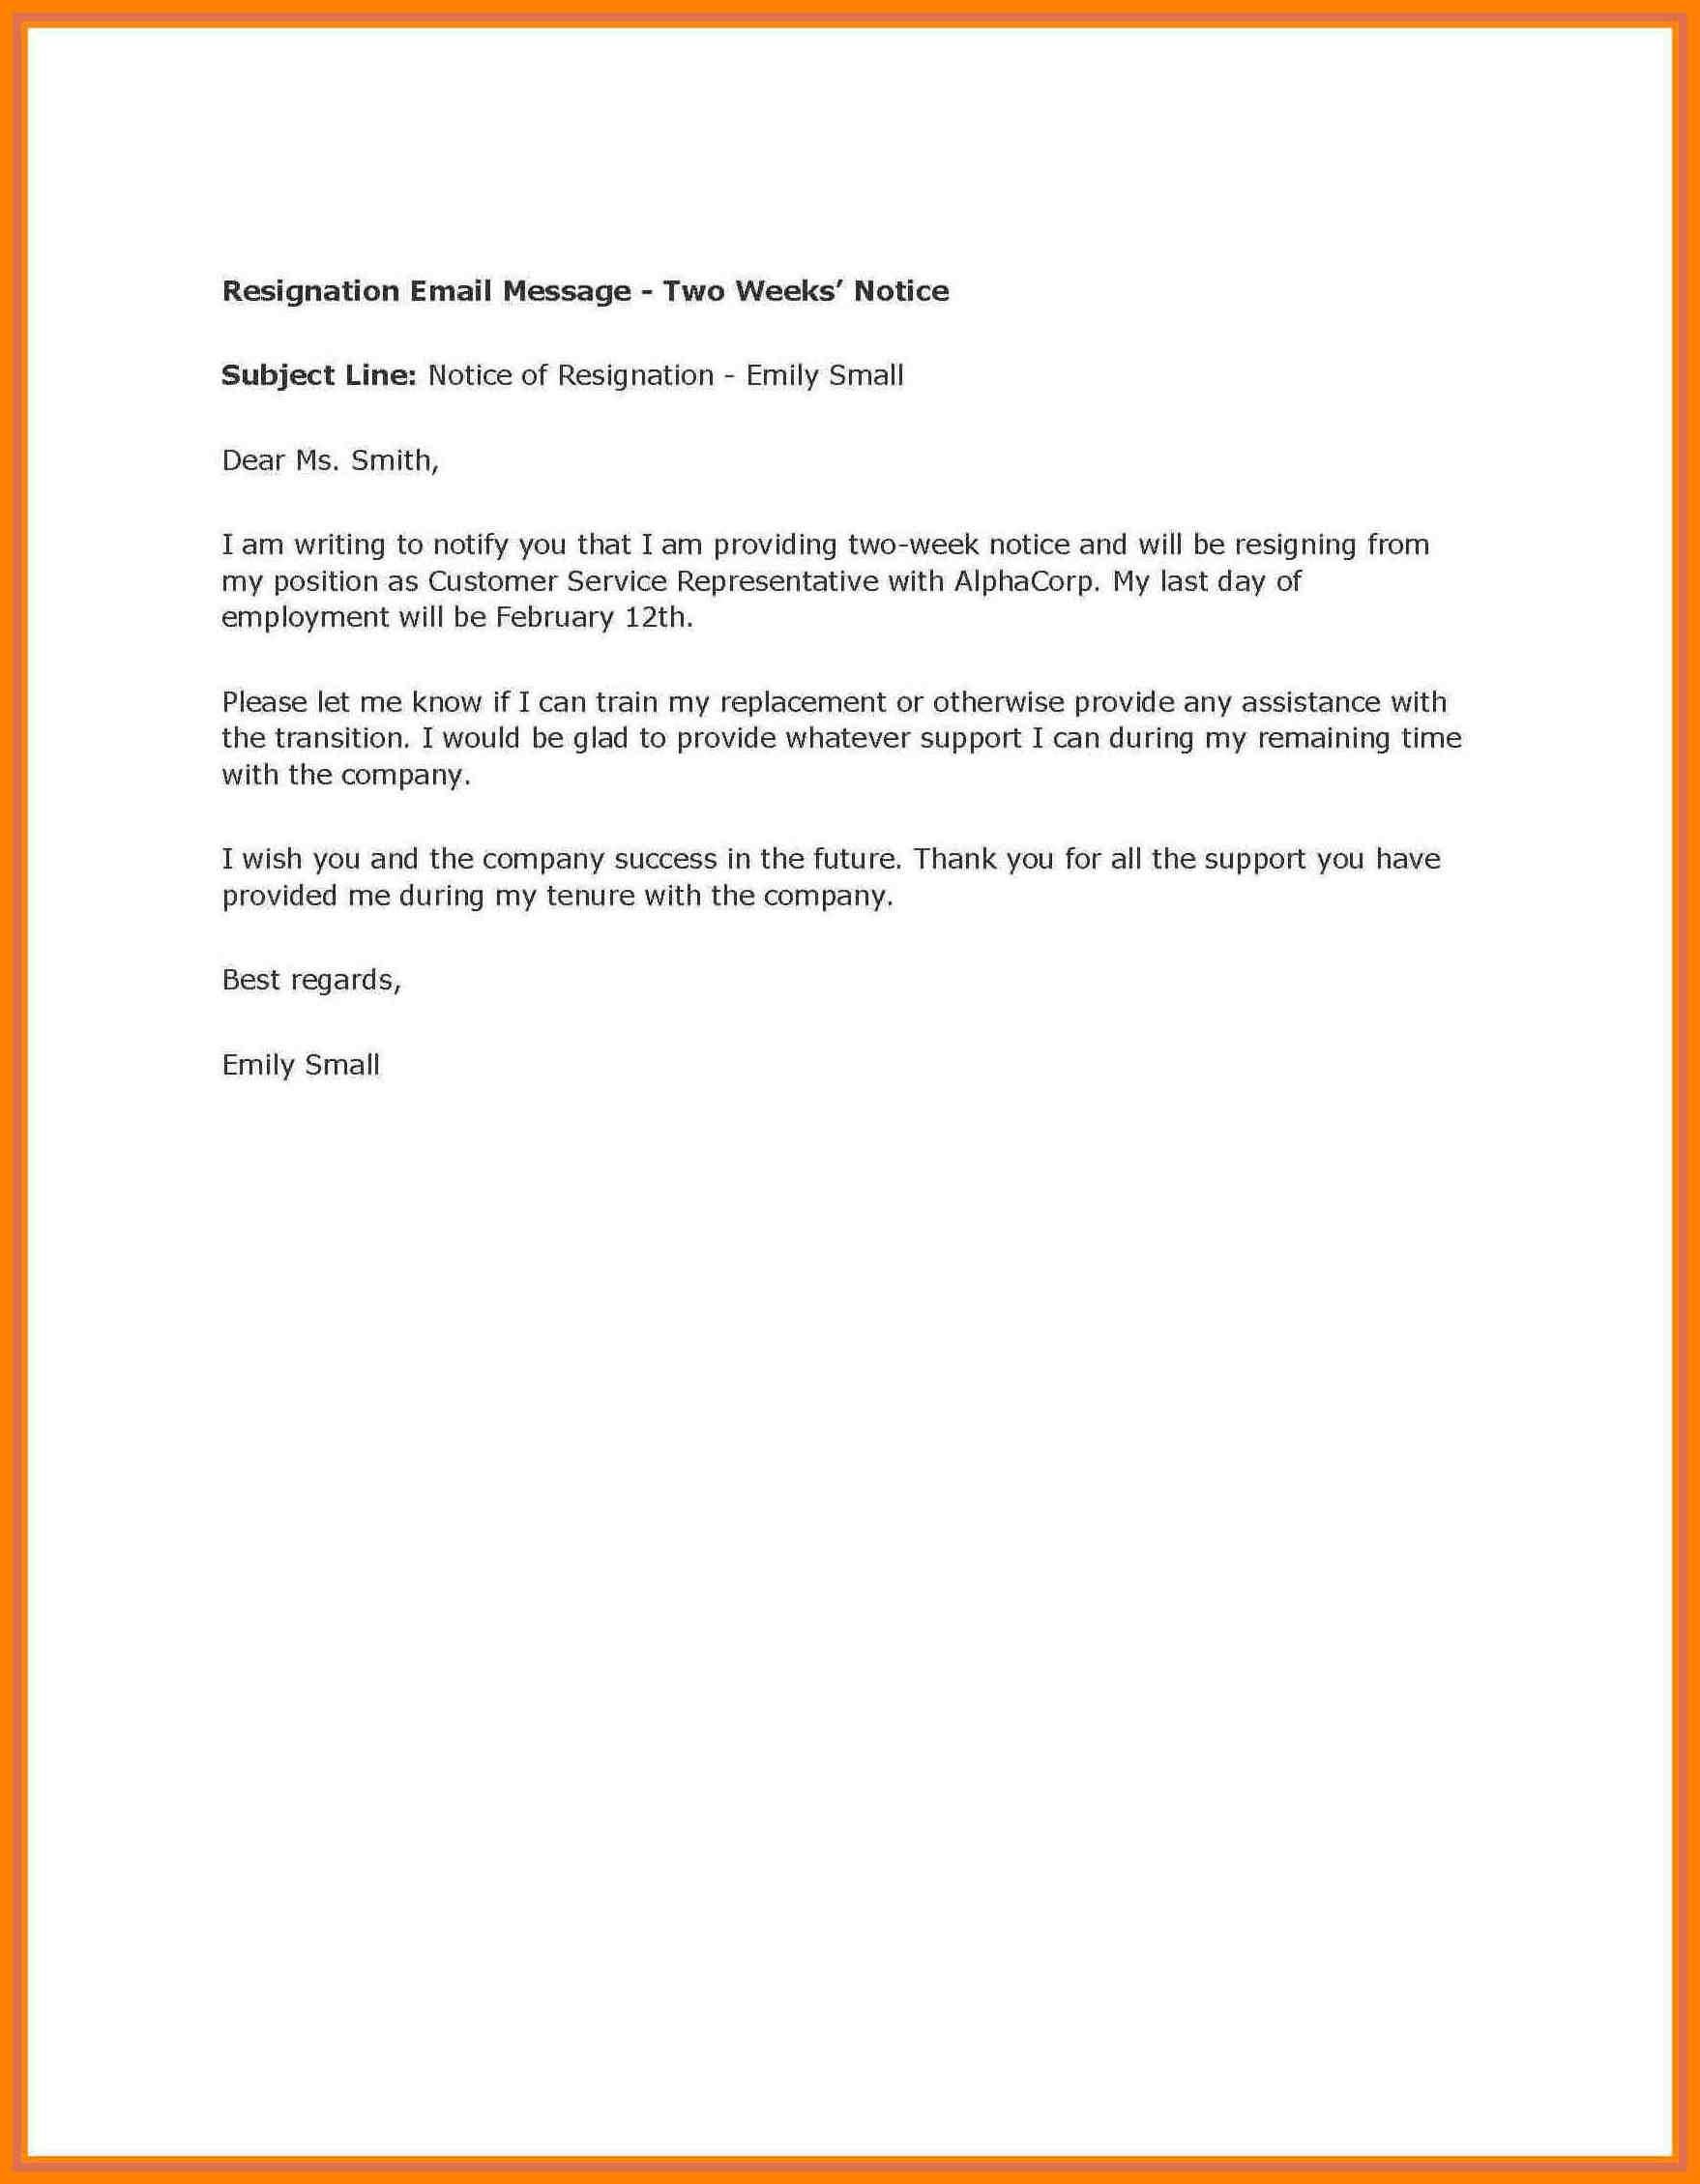 2 Weeks Notice Template Word - Mahre.horizonconsulting.co Intended For 2 Weeks Notice Template Word